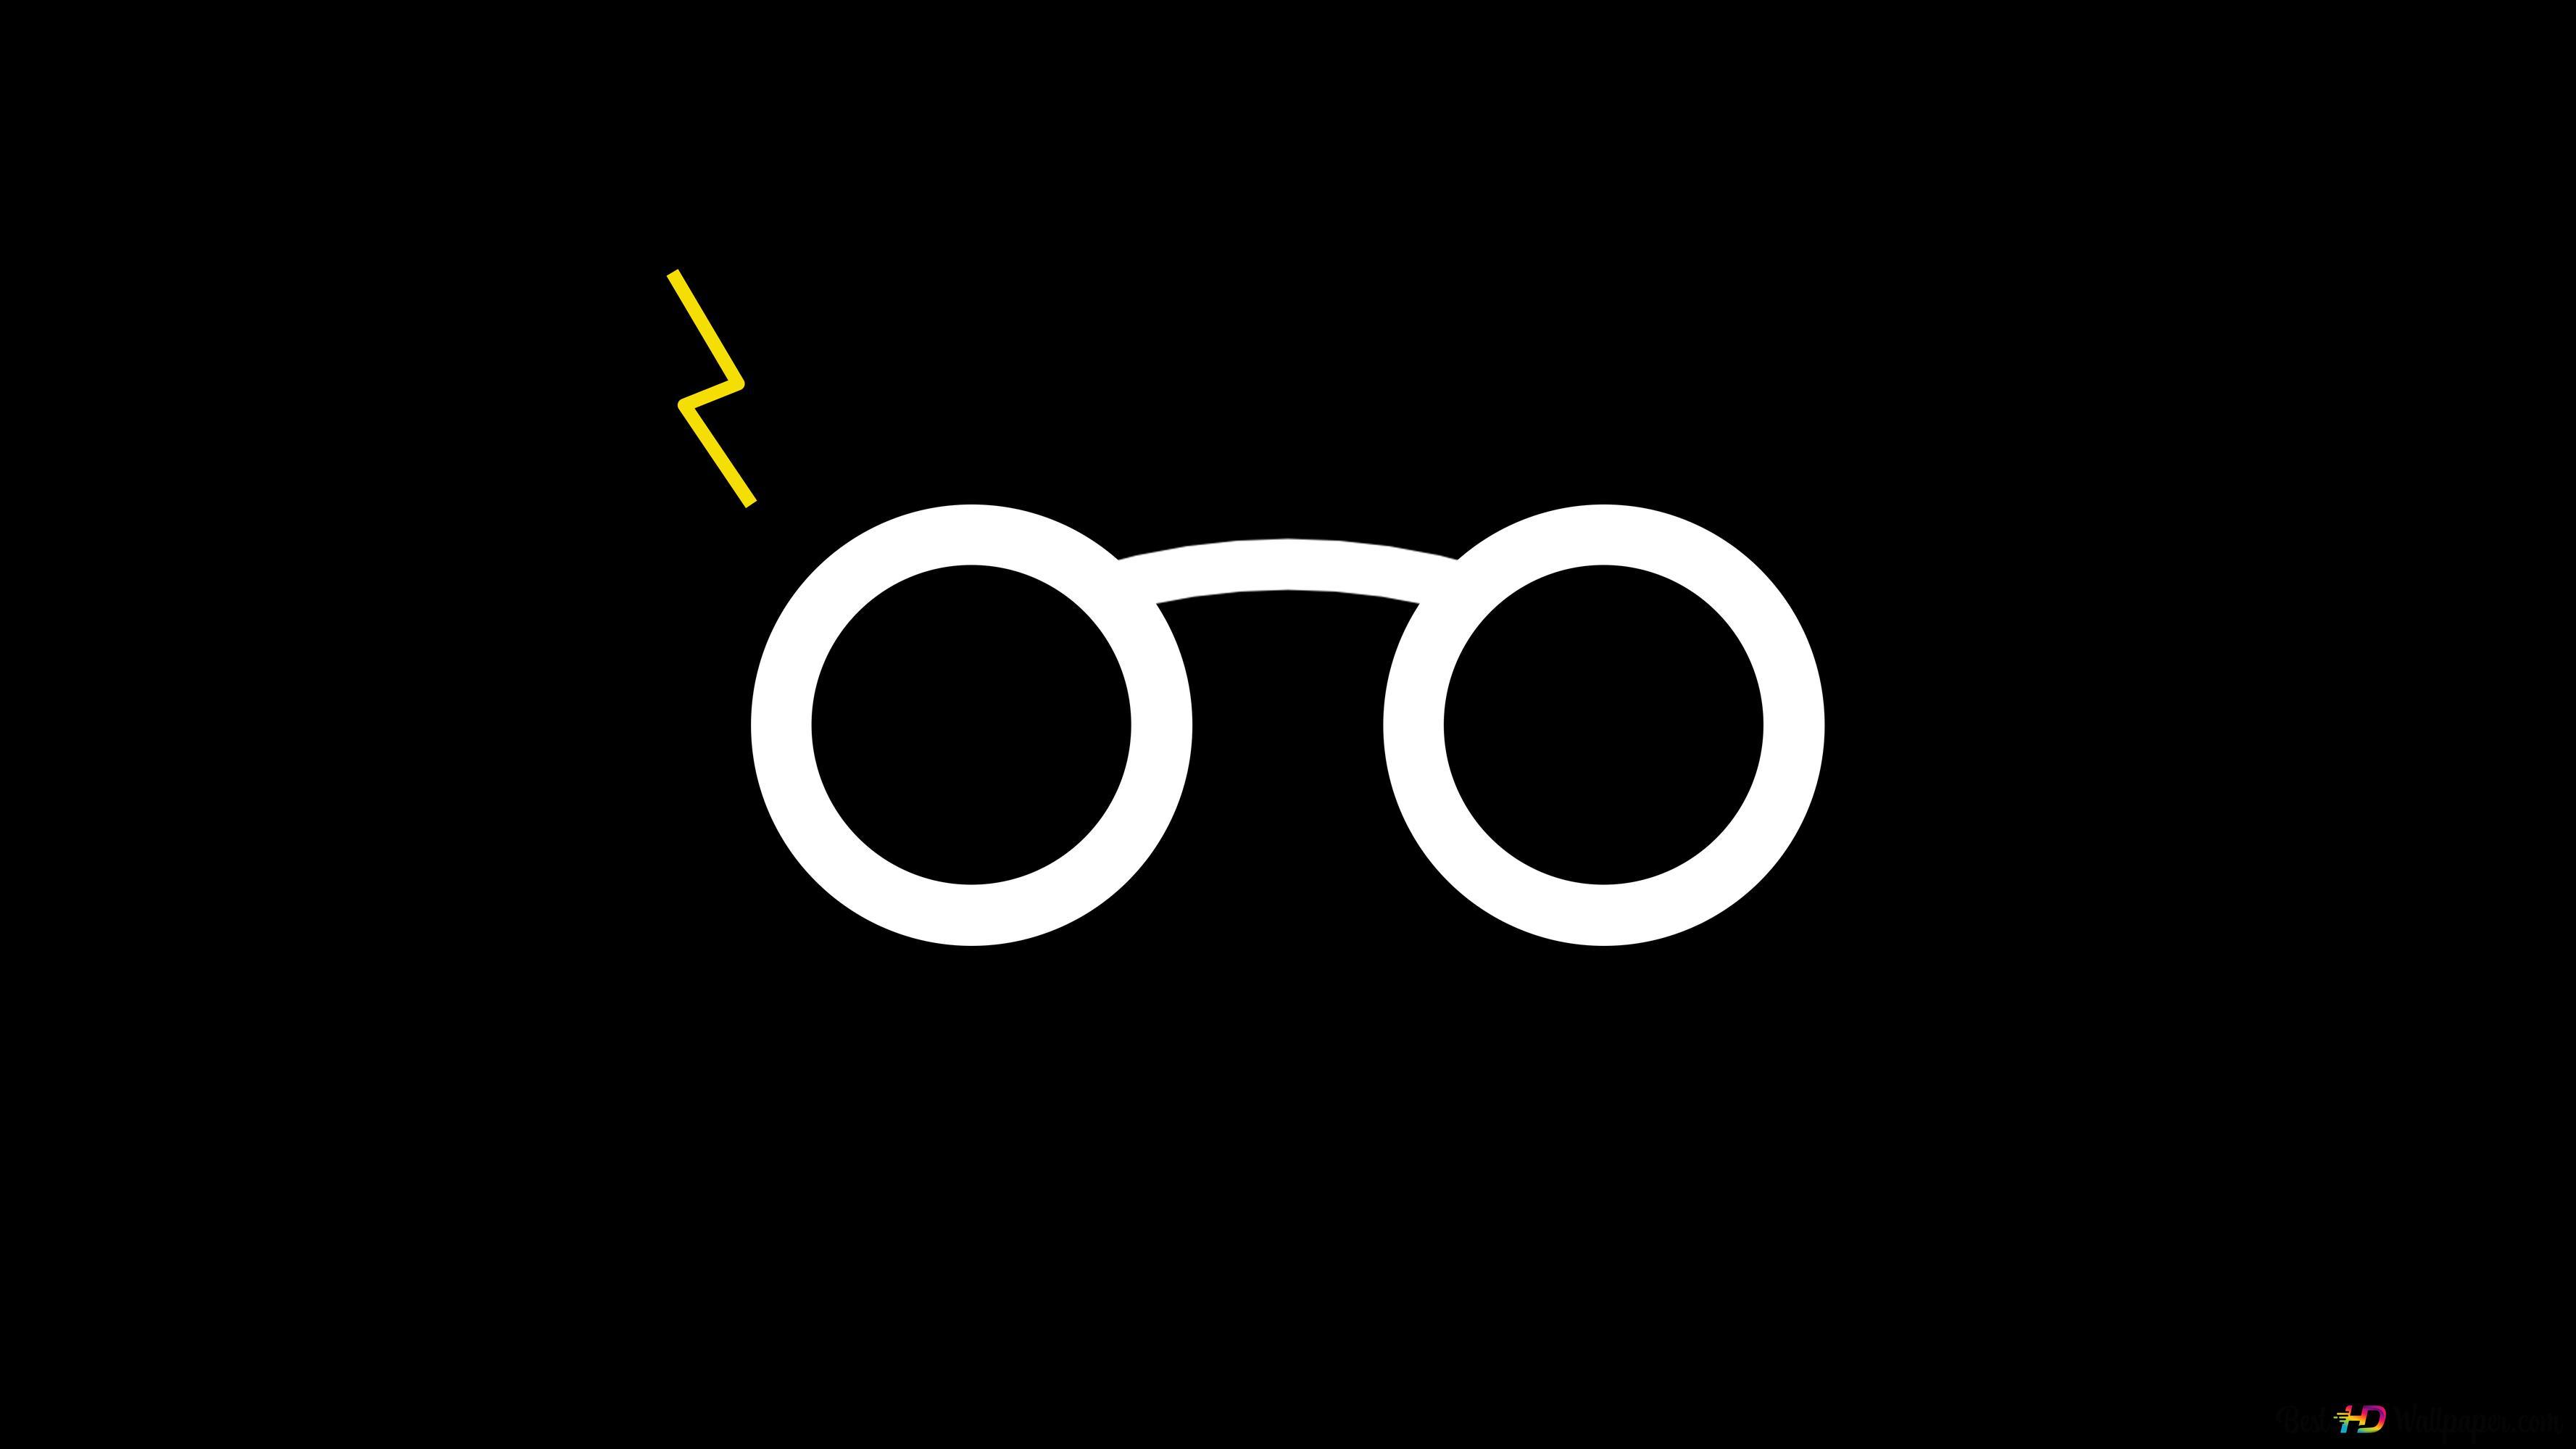 Harry Potter Minimal Hd Wallpaper Download